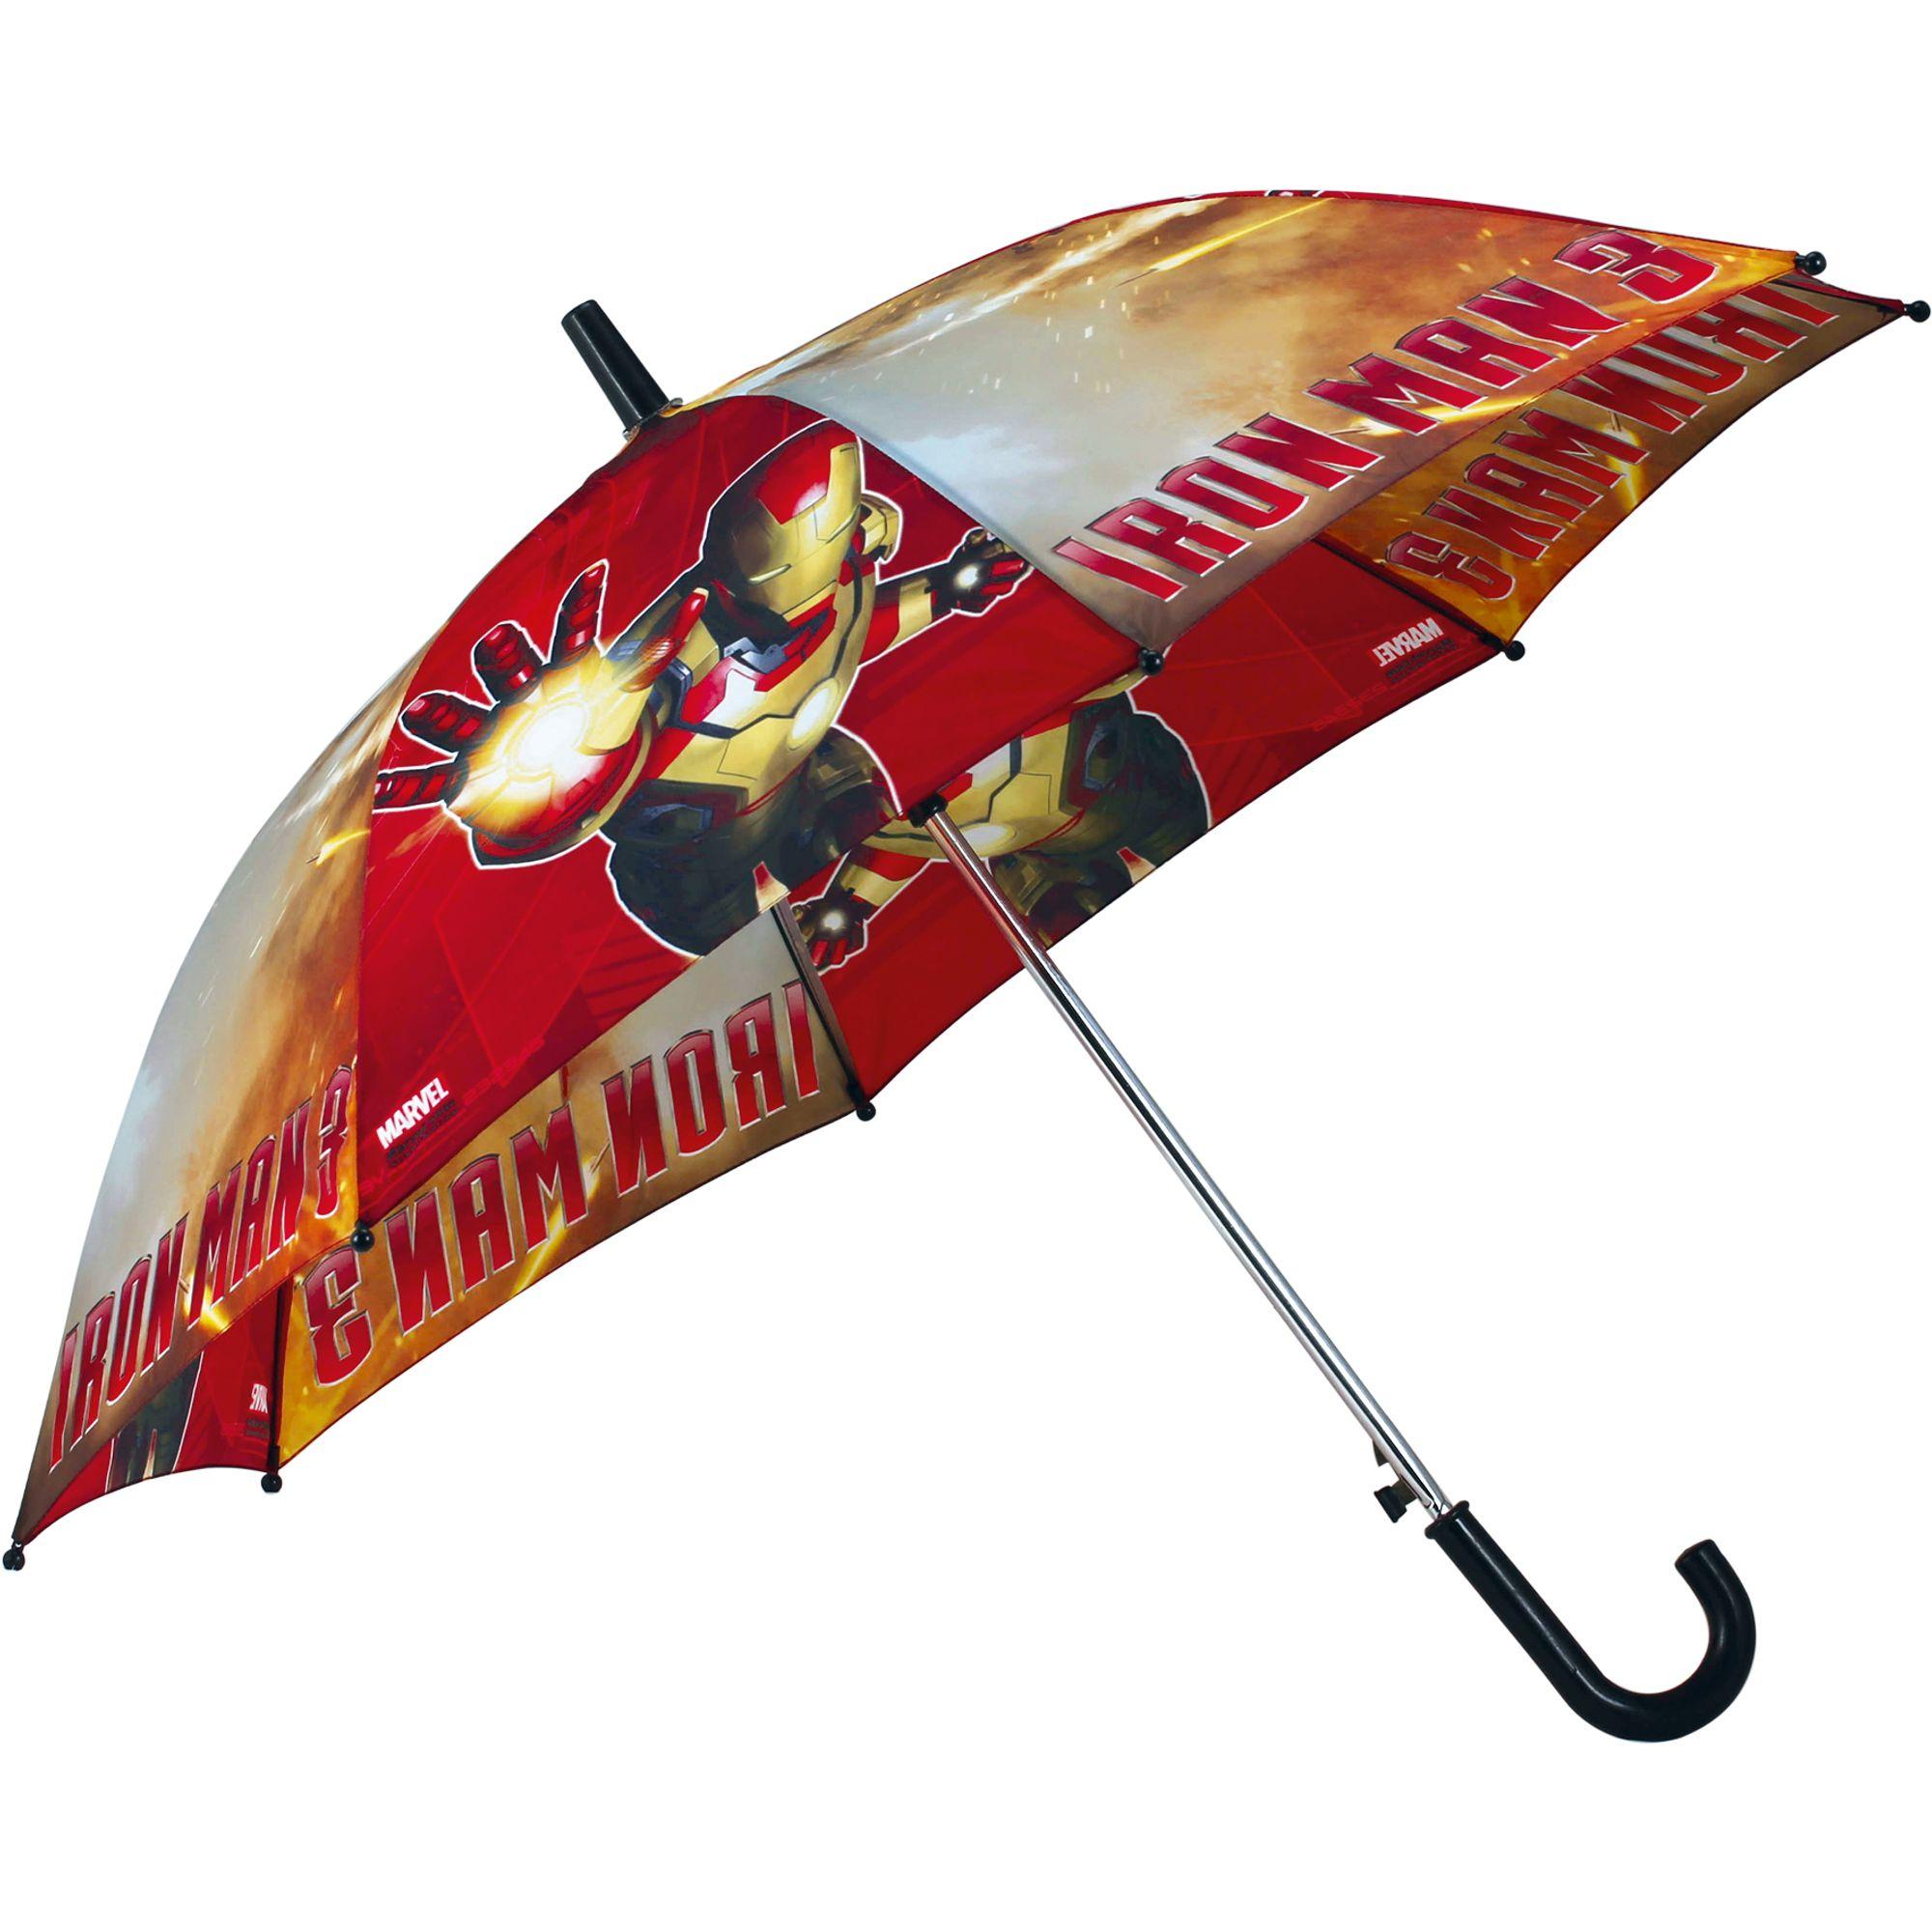 guarda-chuva-homem-de-ferro-ironman